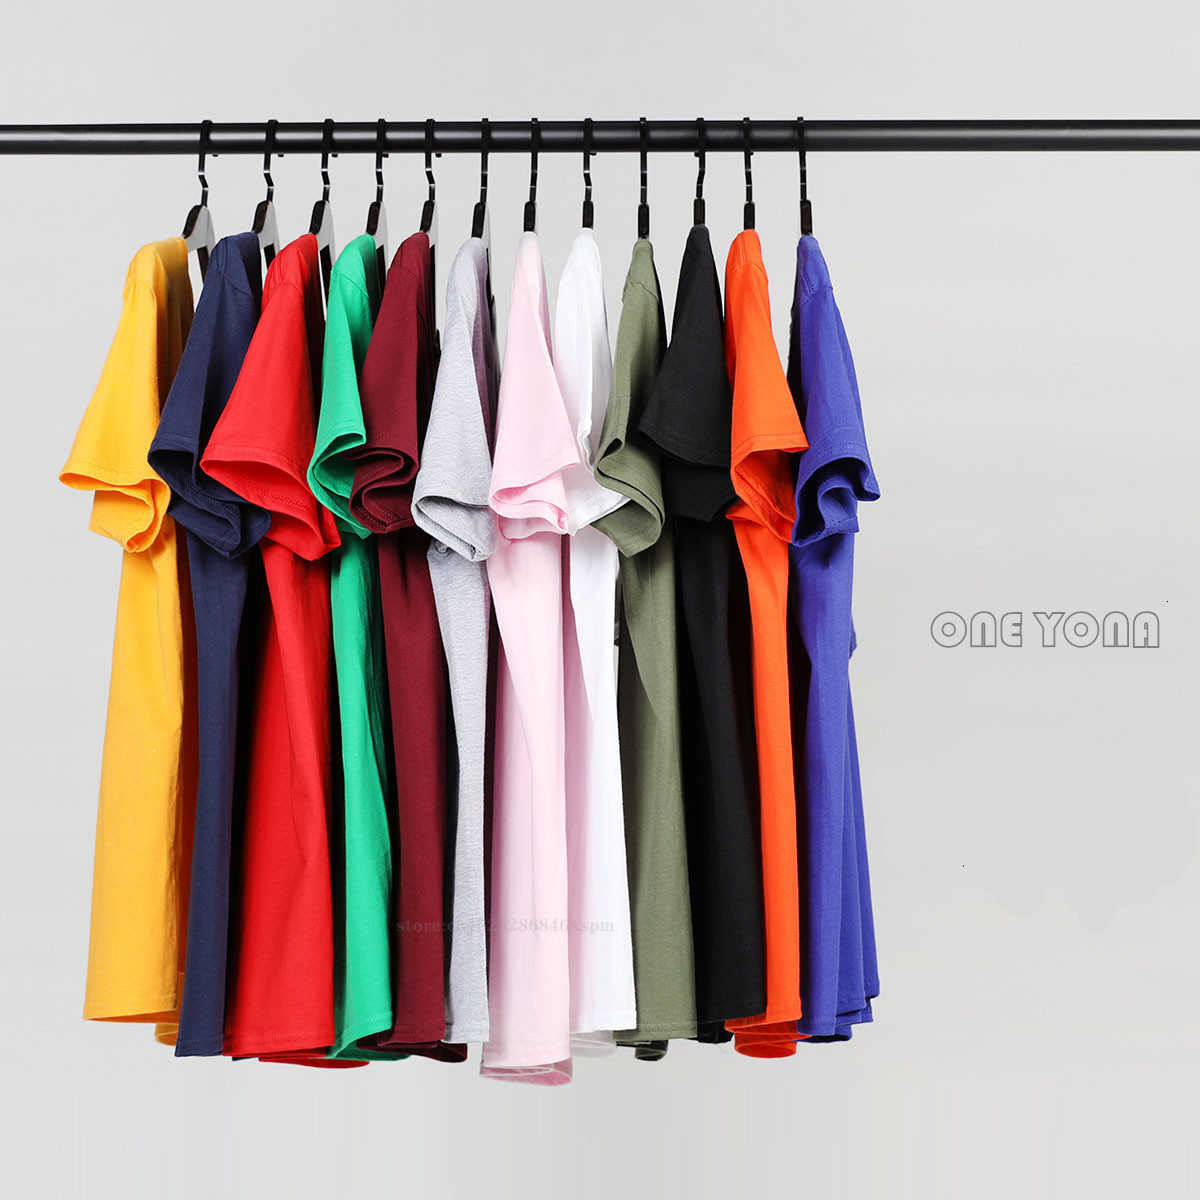 One yona Linux Just Sudo It Geek T-Shirt pour hommes Vintage 100% coton T-Shirt col rond manches courtes t-shirts grande taille hauts